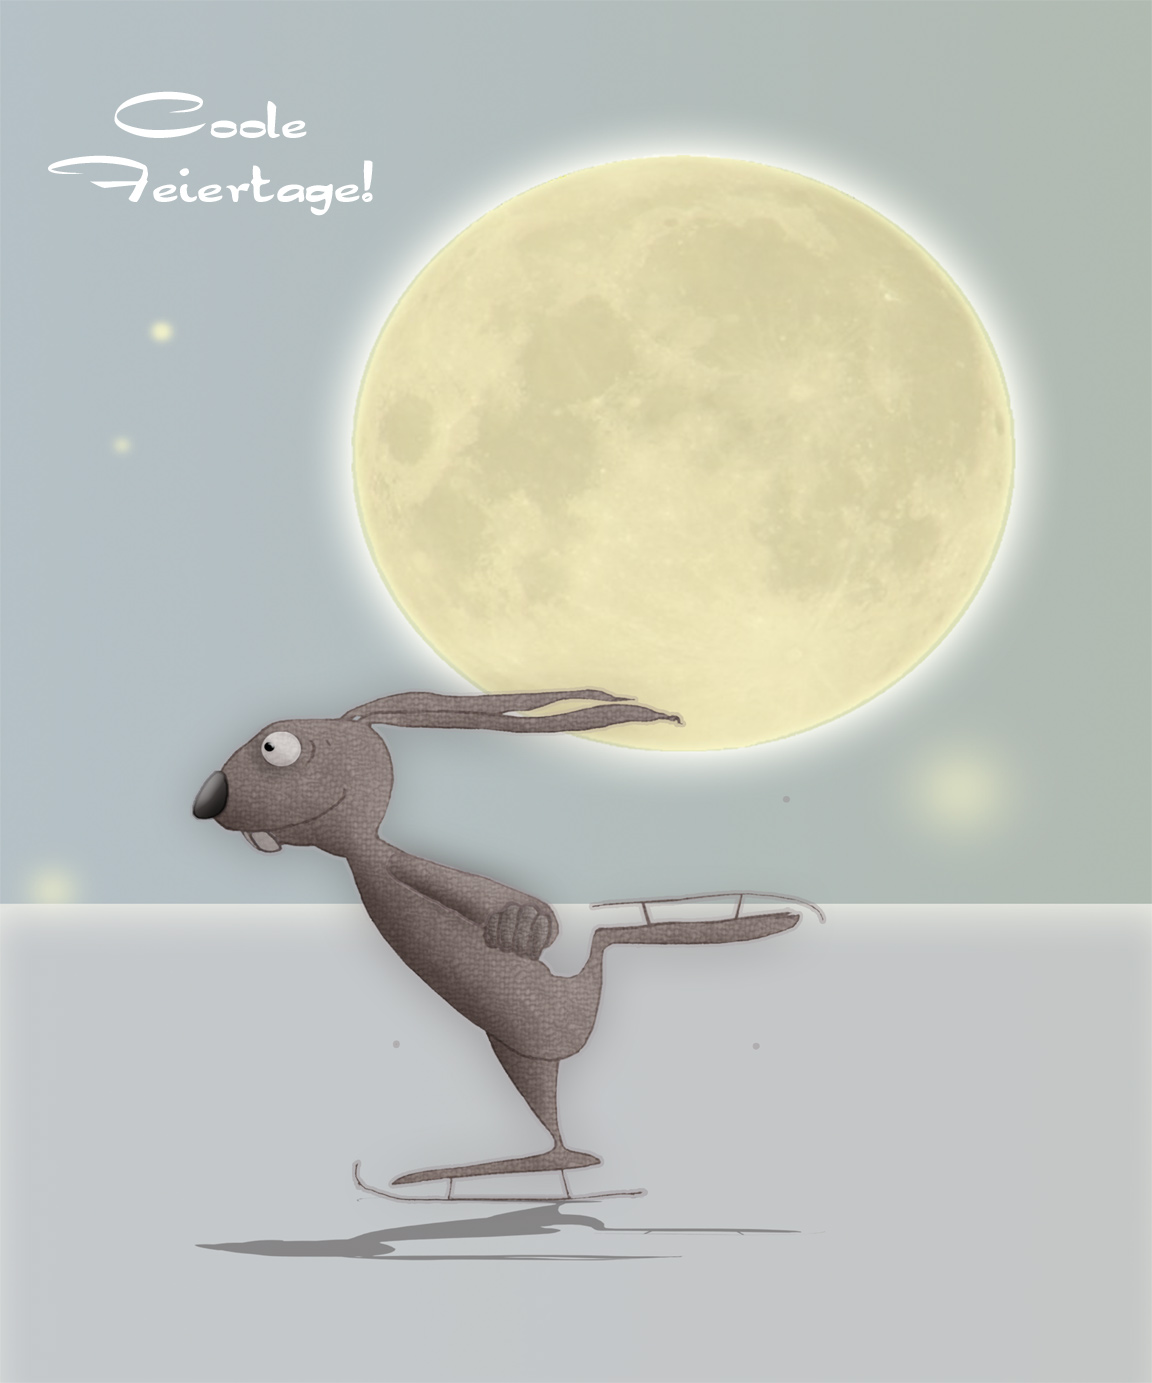 Christmas Rabbit - Weihnachtskarte